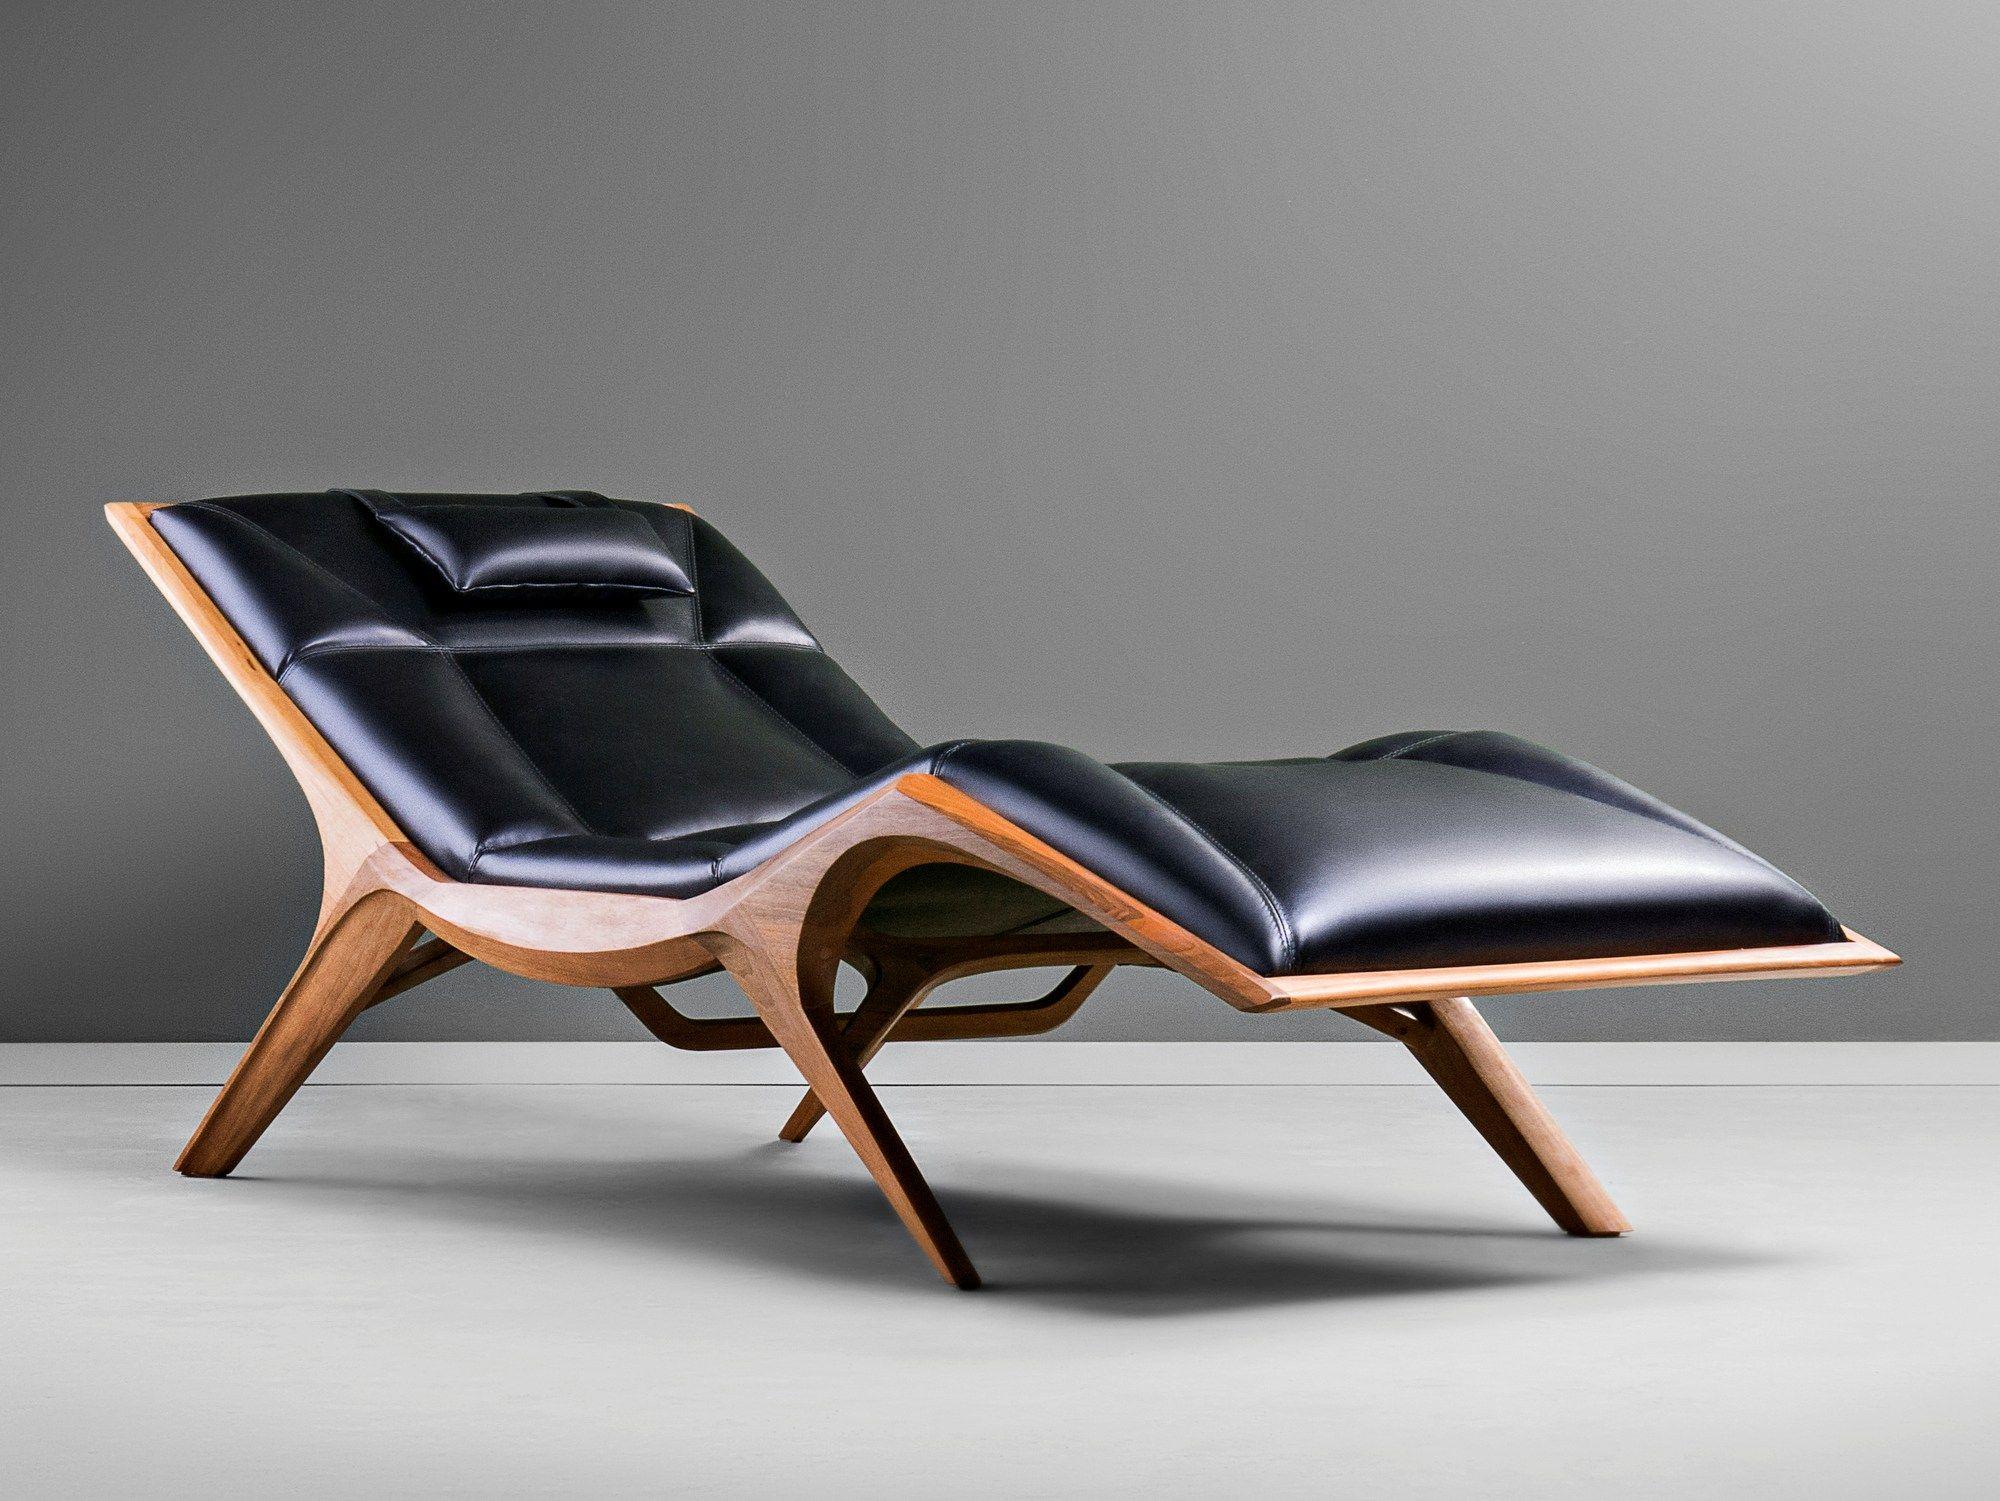 Upholstered Leather Chaise Longue Insekt By Hookl Und Stool Design Aleksandar Ugresic Leather Chaise Leather Lounge Chair Lounge Chair Design